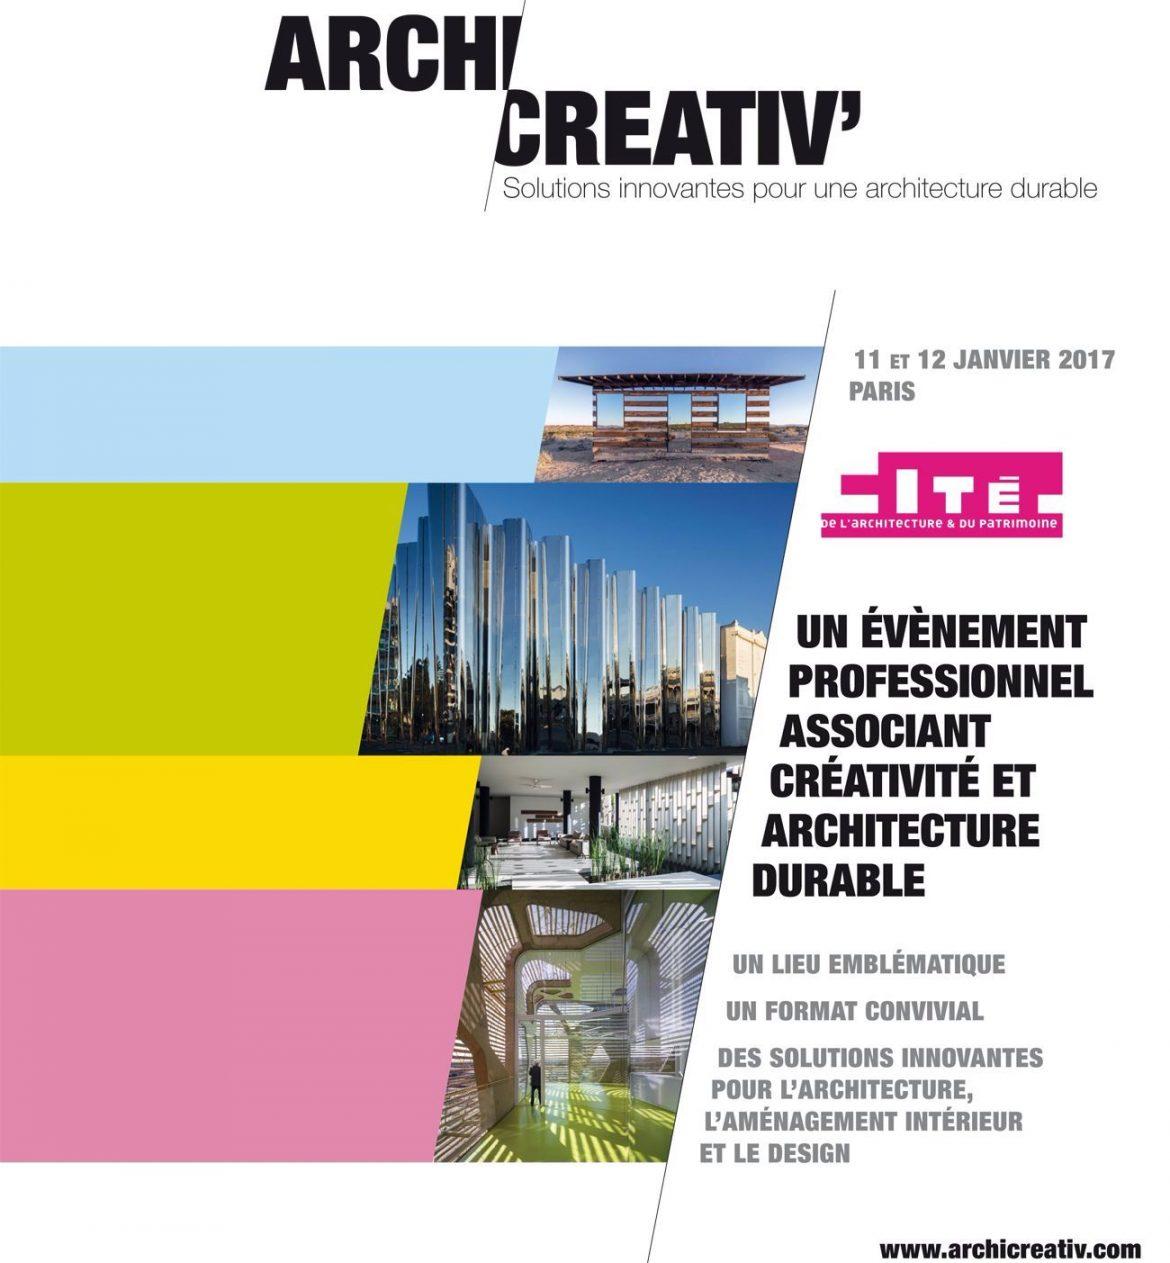 Archicreativ 1170x1263 - Archicreativ', un événement BeeMedias et ThemaDesign